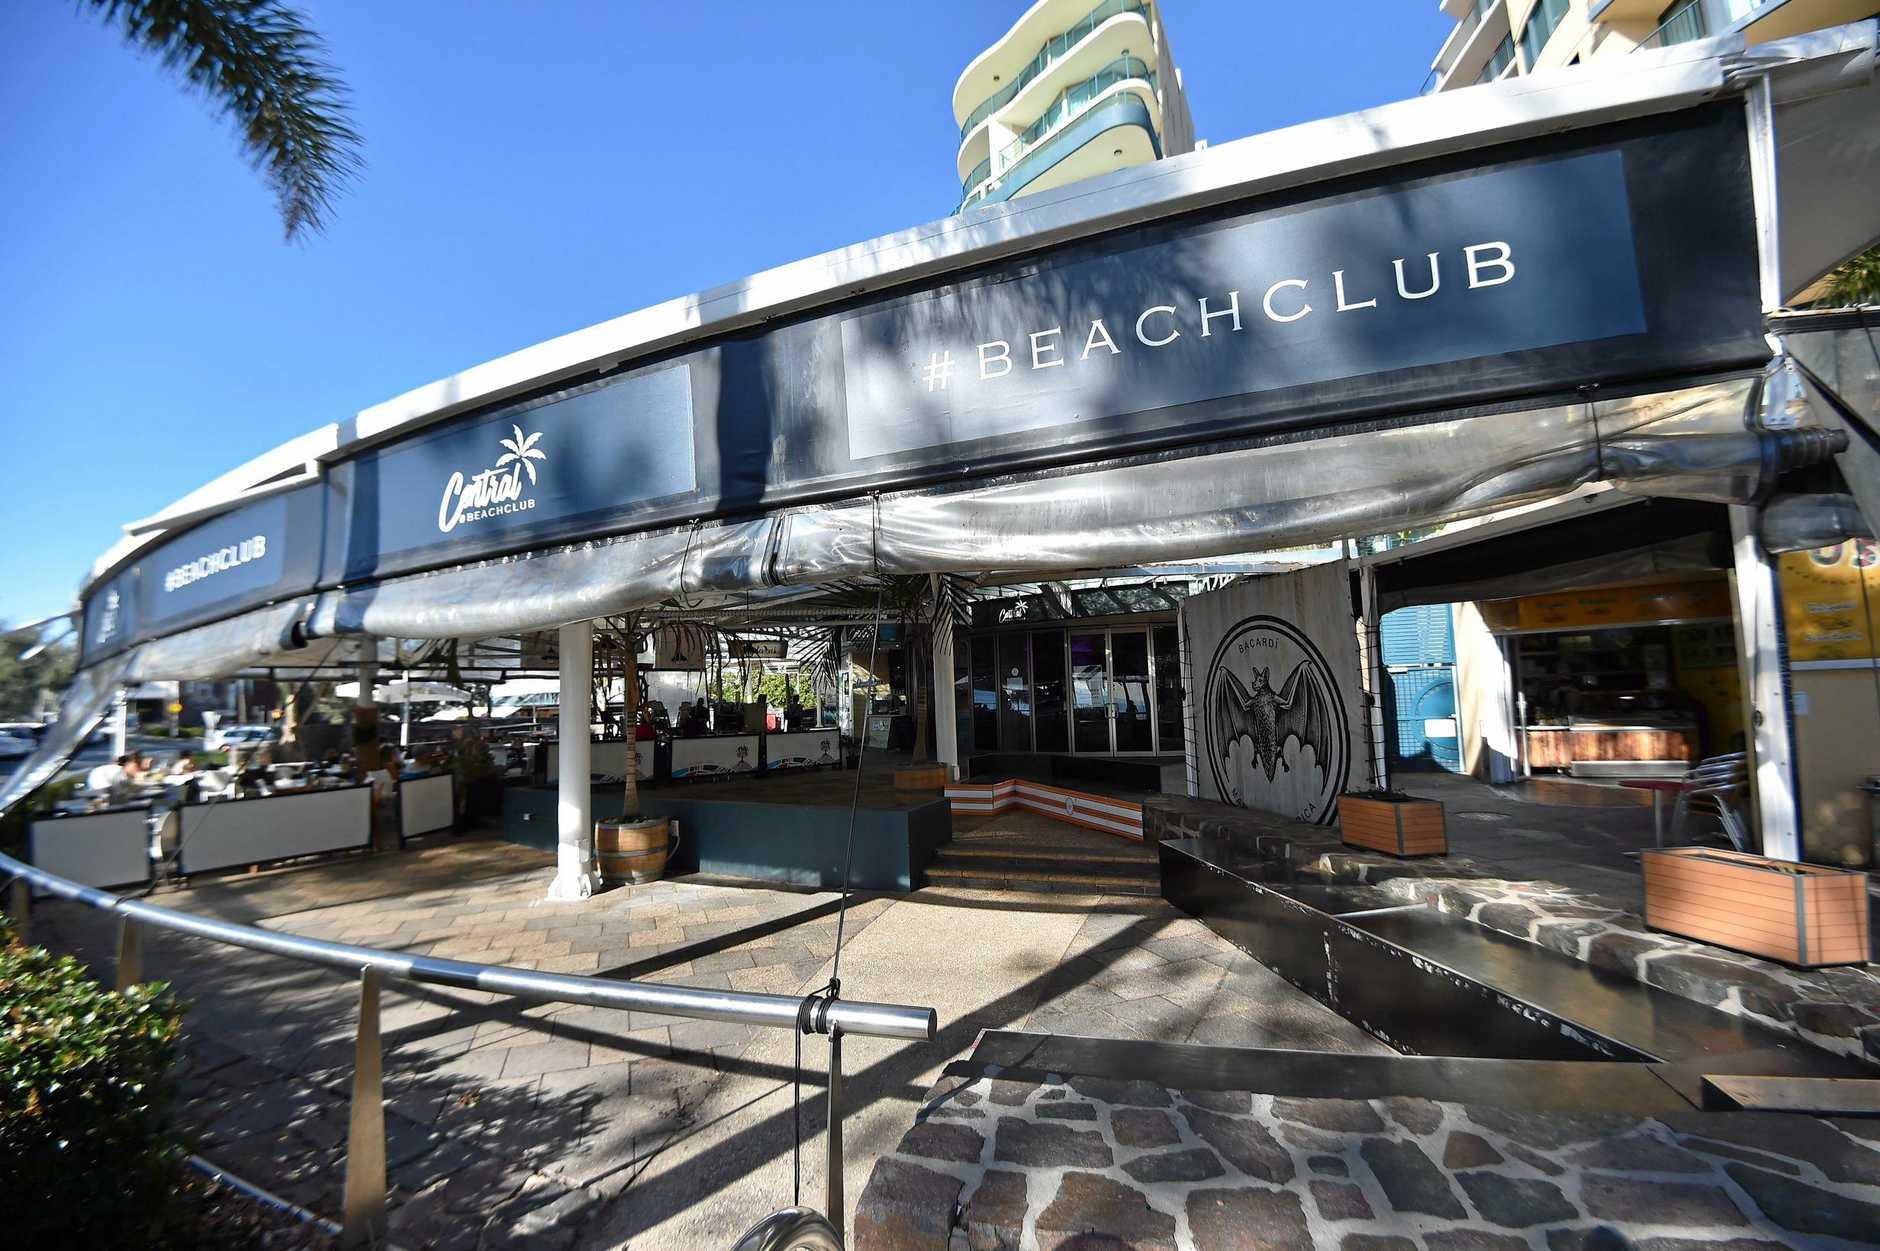 Central Beach Club Mooloolaba and Hashtag #Phresh on Mooloolaba Esplanade are up for lease.